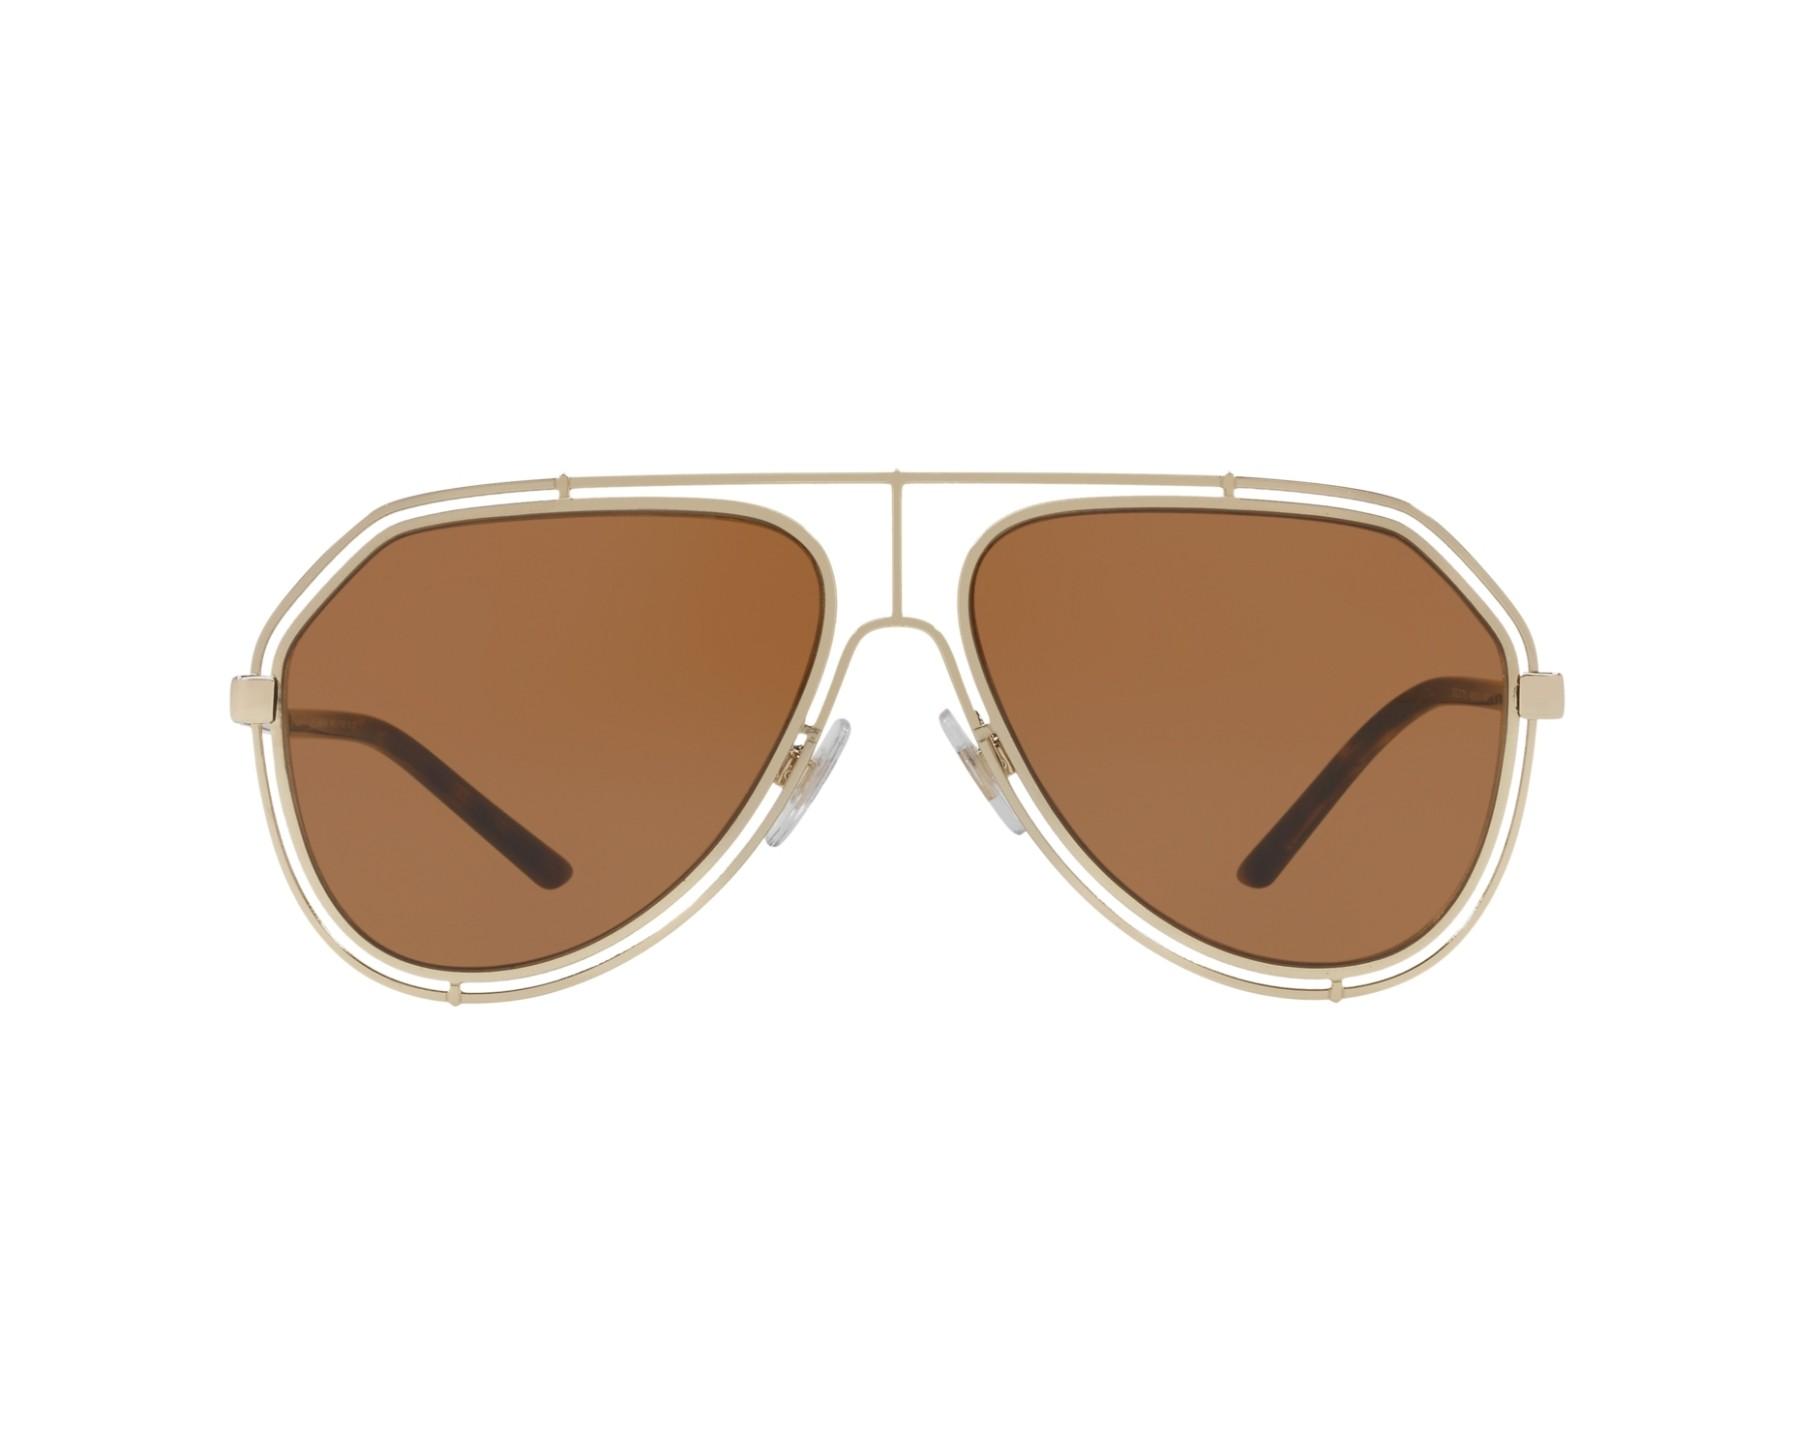 6c02b0a4e198 Sunglasses Dolce   Gabbana DG-2176 488 73 59-15 Gold 360 degree